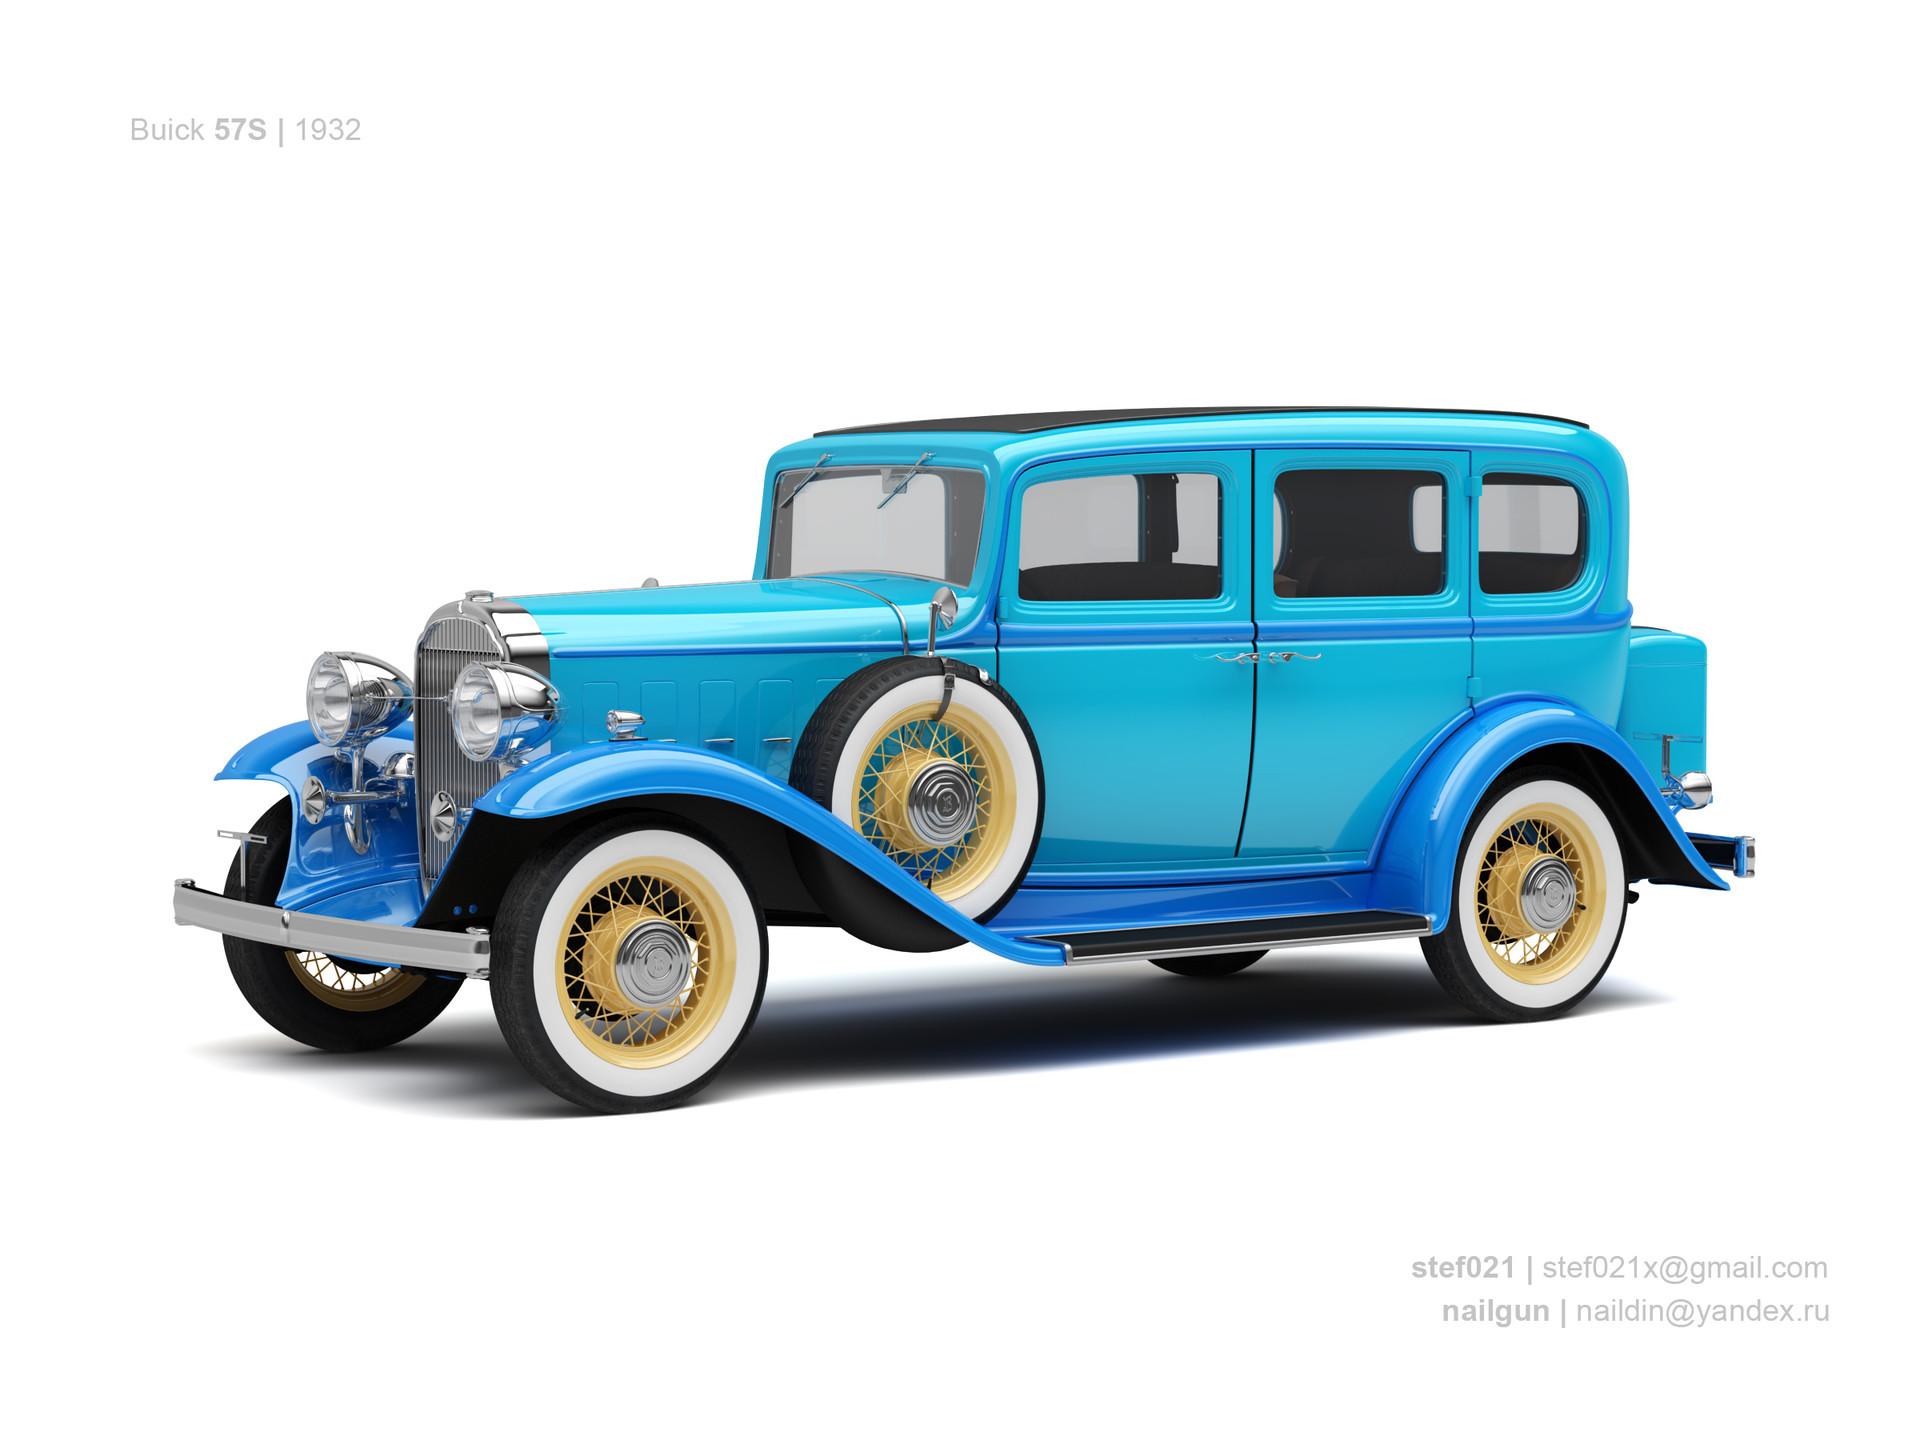 Nail khusnutdinov usa buick 57s 1932 0